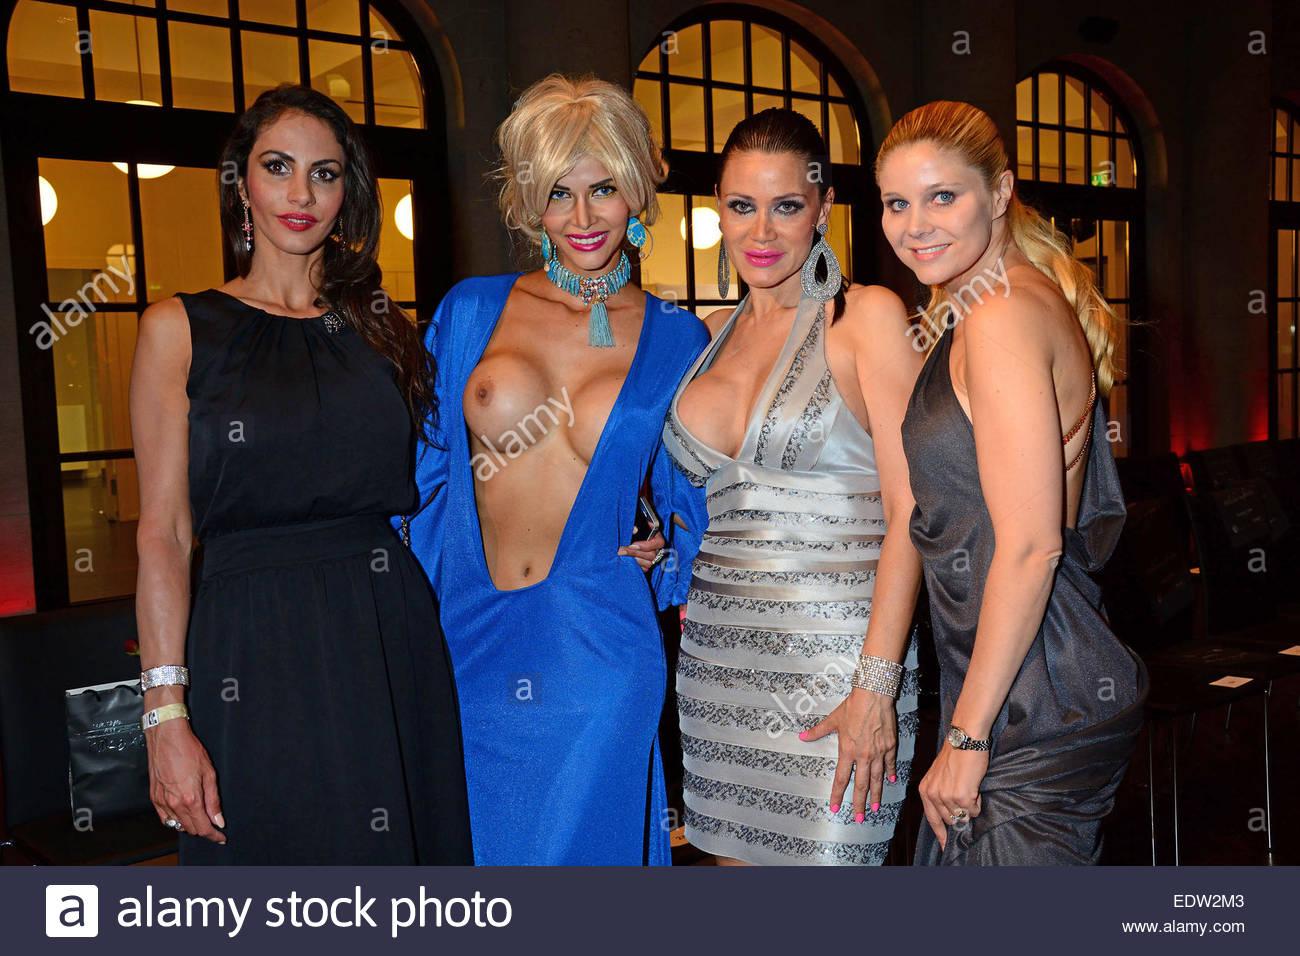 Janina Youssefian, Micaela Schaefer, Djamila Rowe, Yvoenne ...